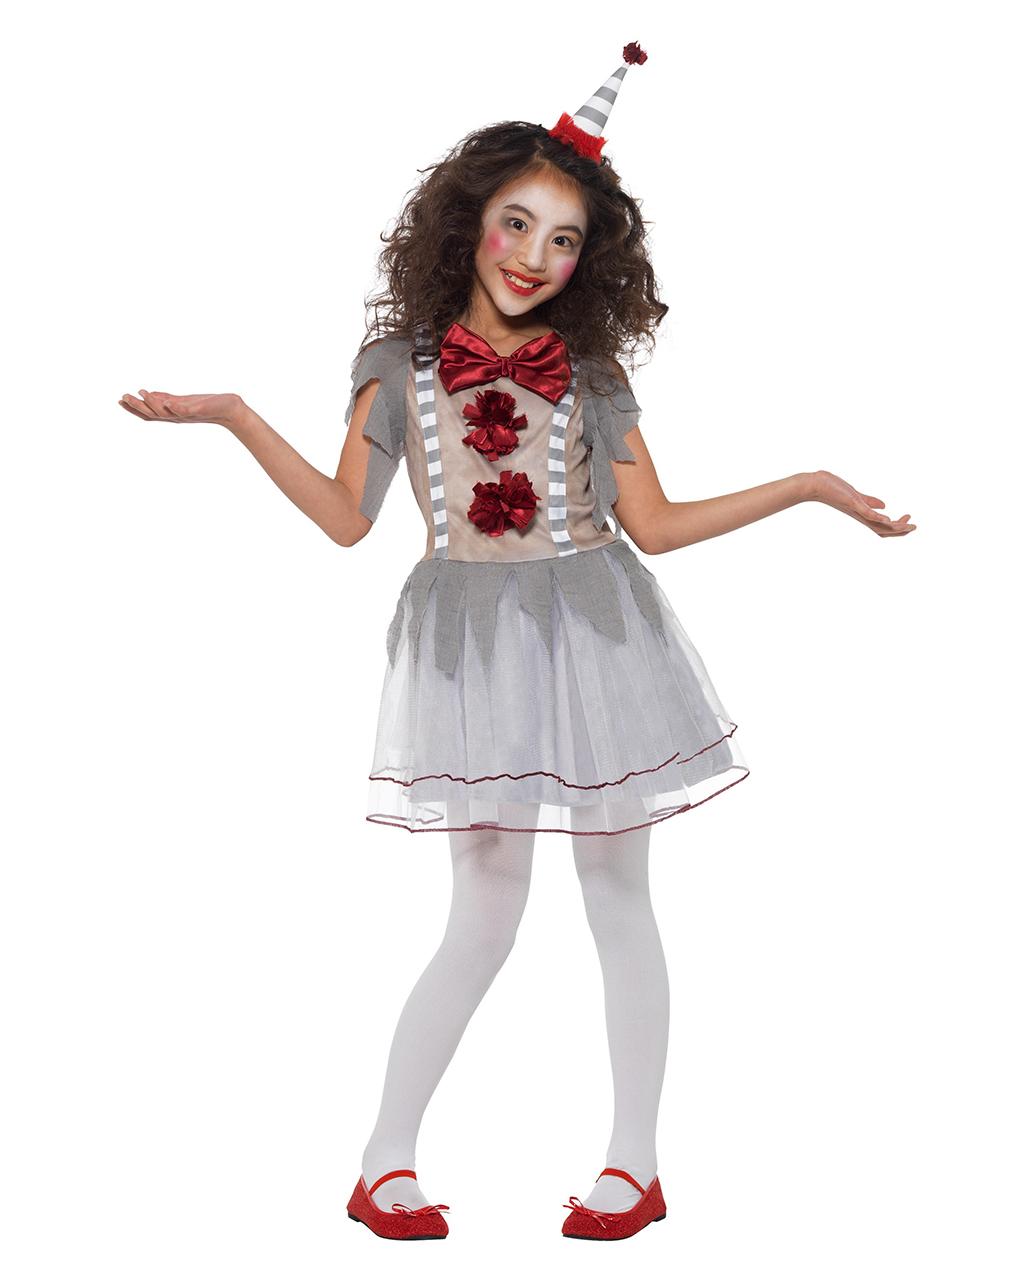 Vintage Horror Clown Madchen Kostum Bestellen Horror Shop Com